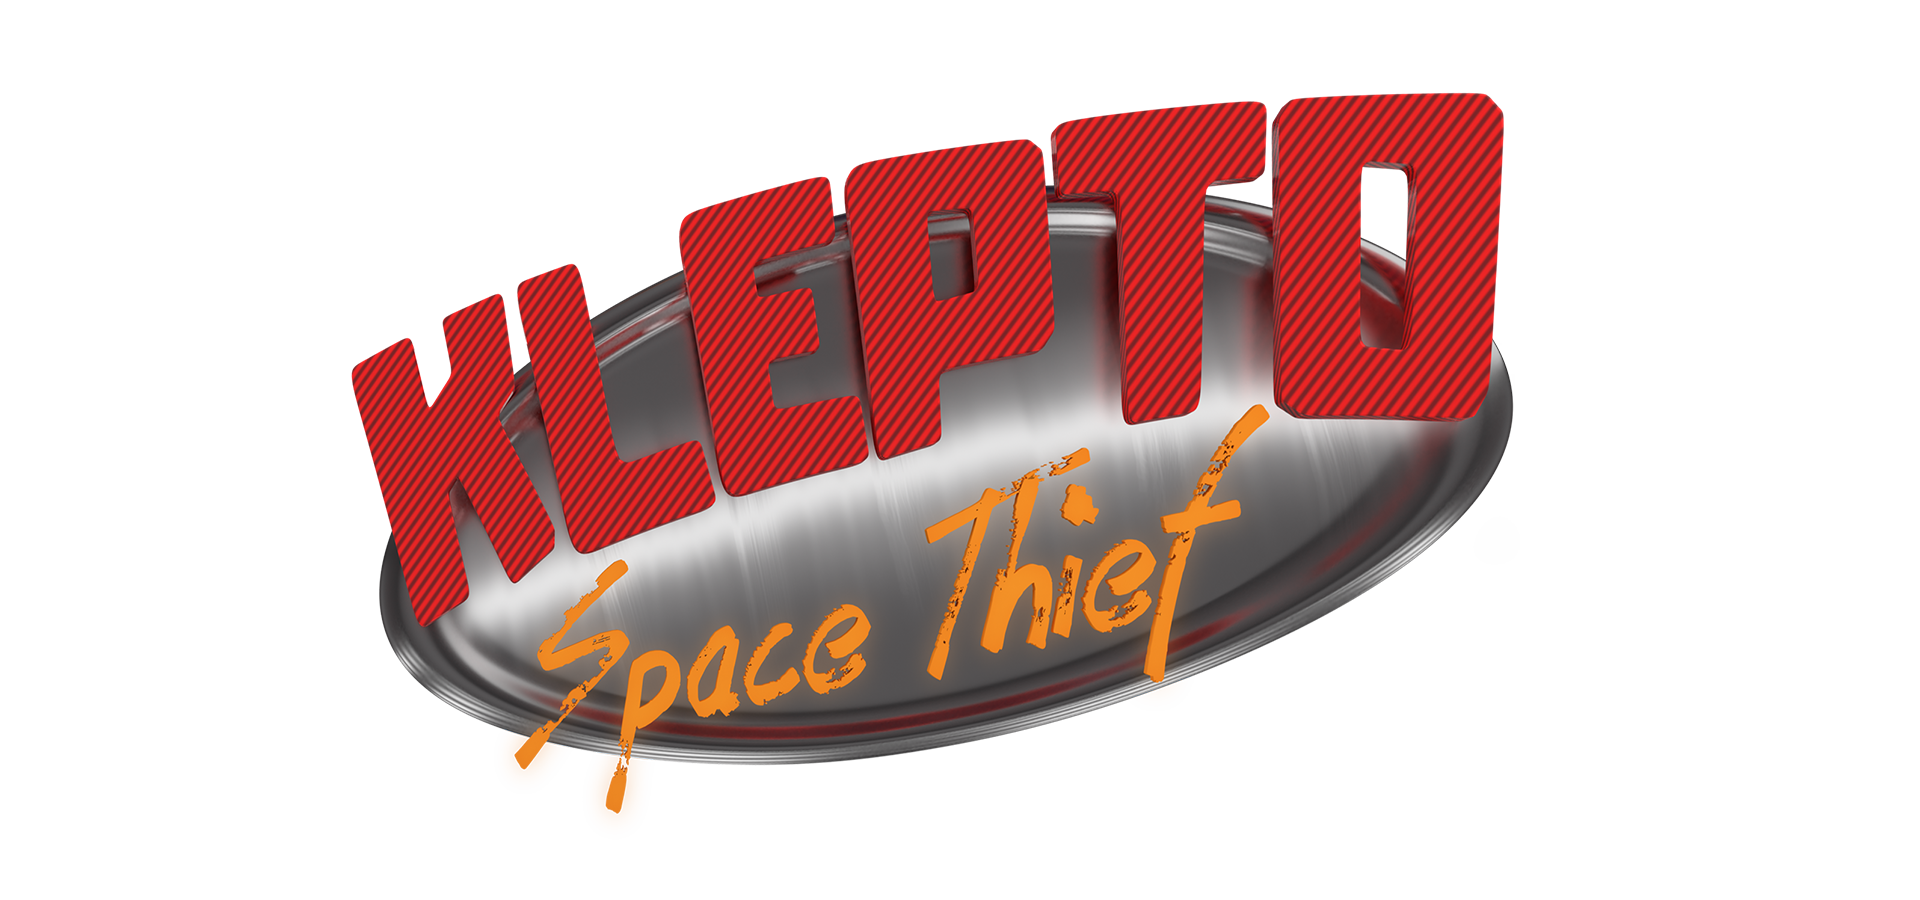 Klepto: Space Thief